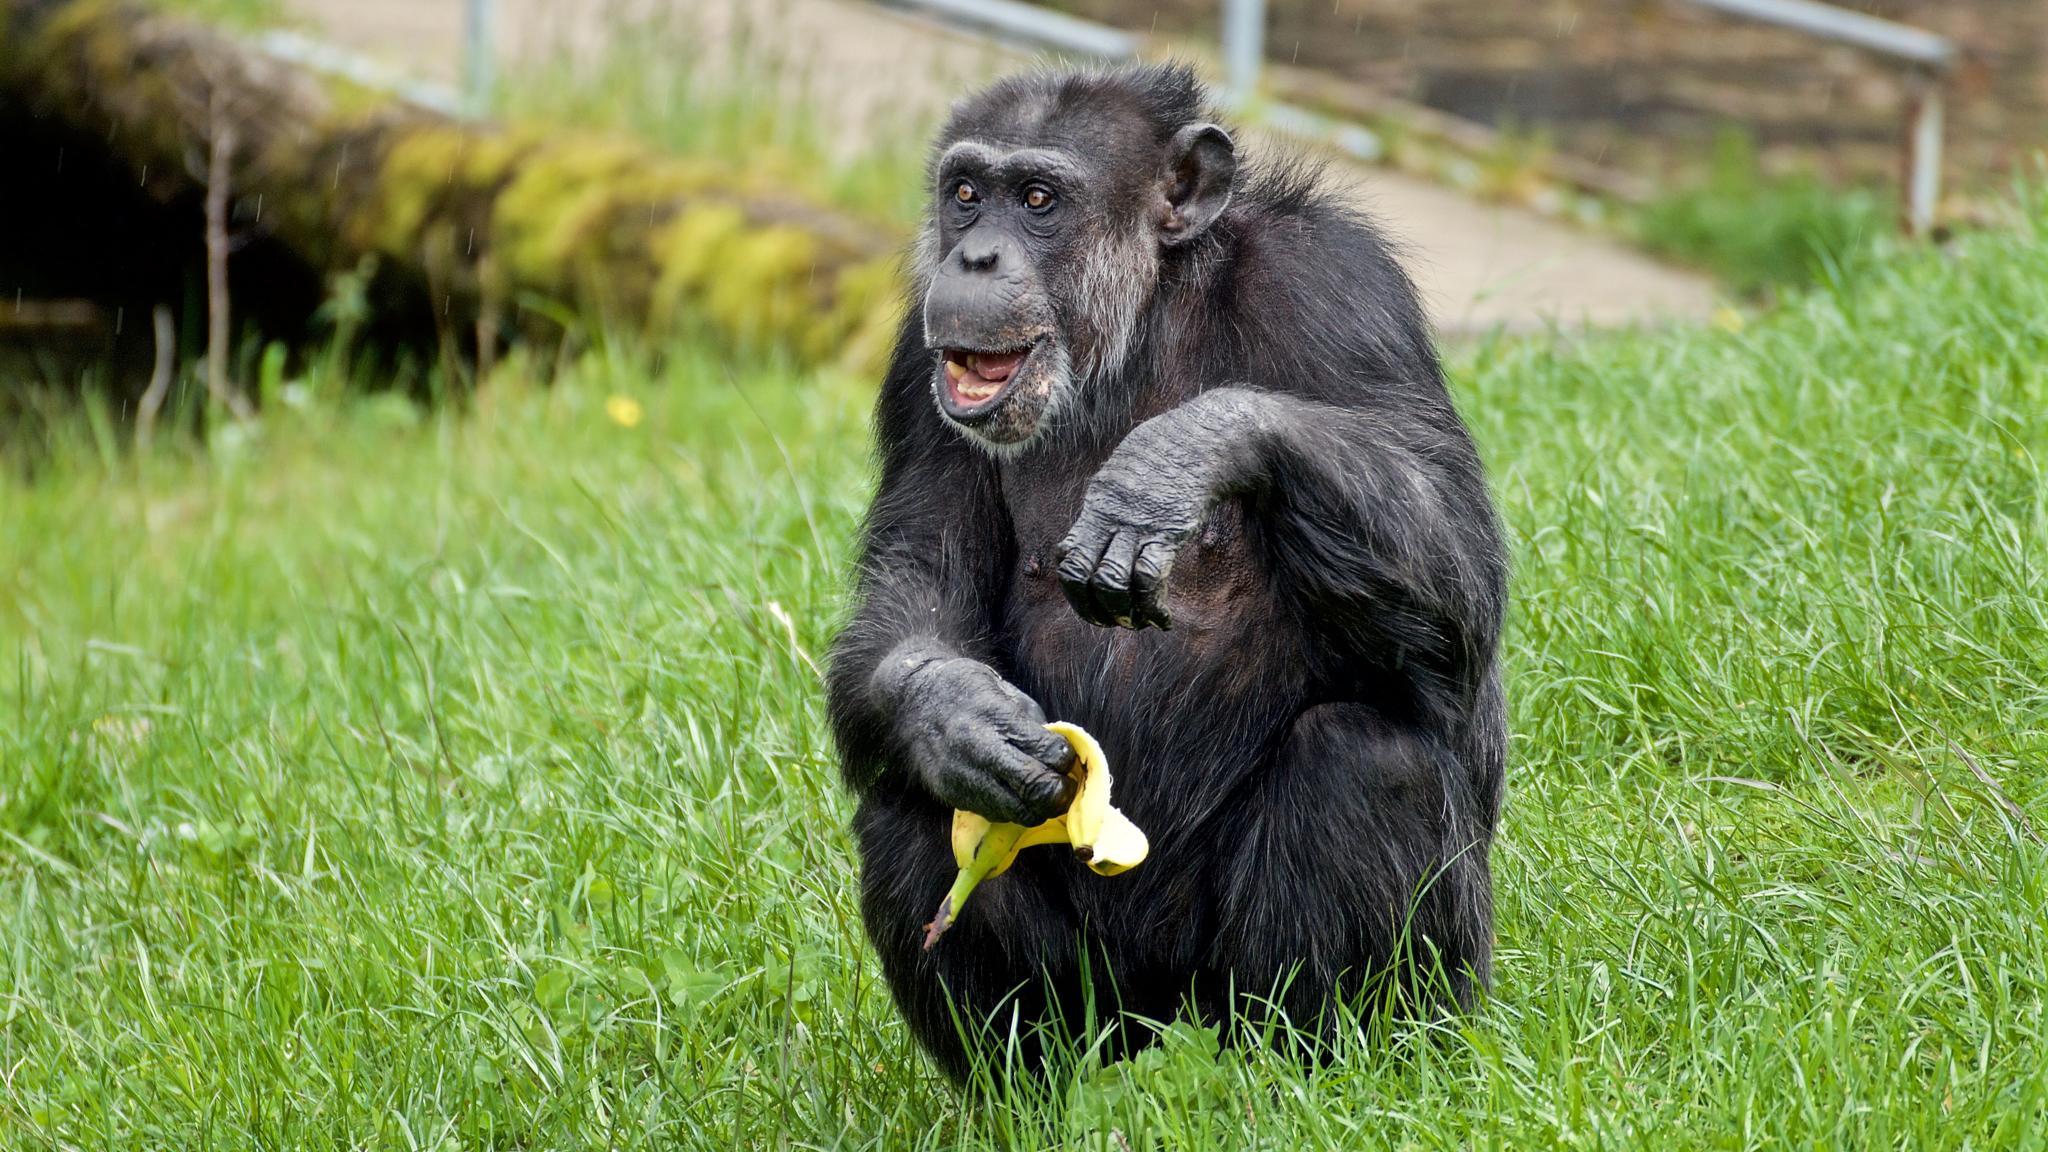 Happy ape. by kent.otterdahl